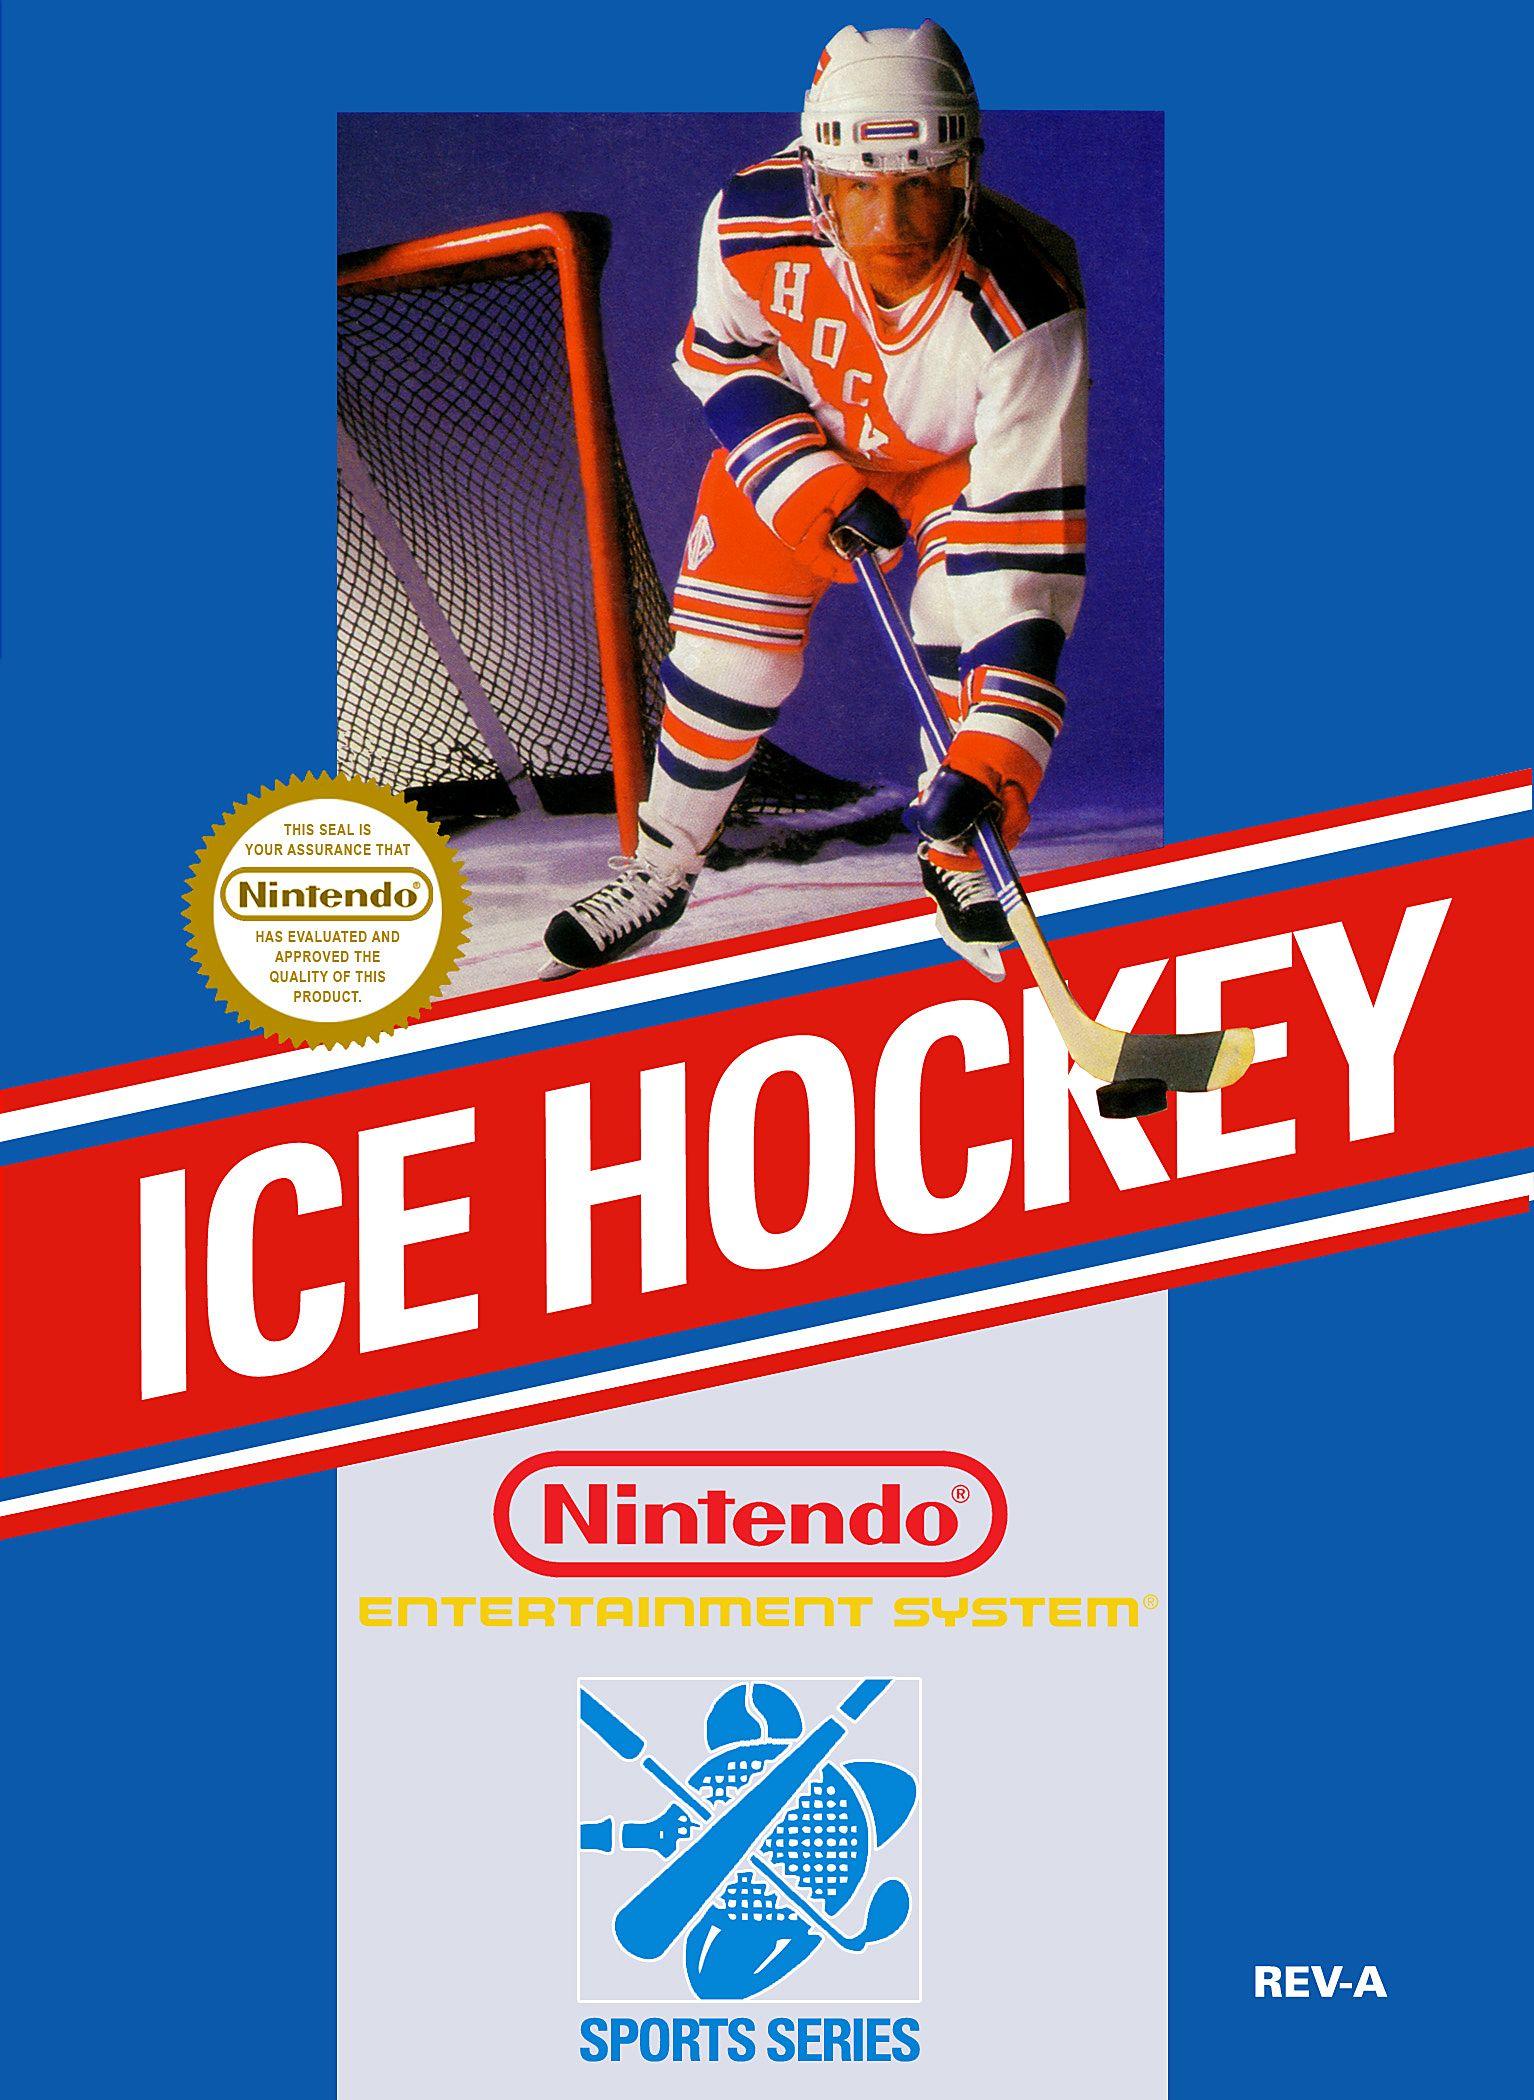 ice hockey nes box art Google Search Nintendo nes